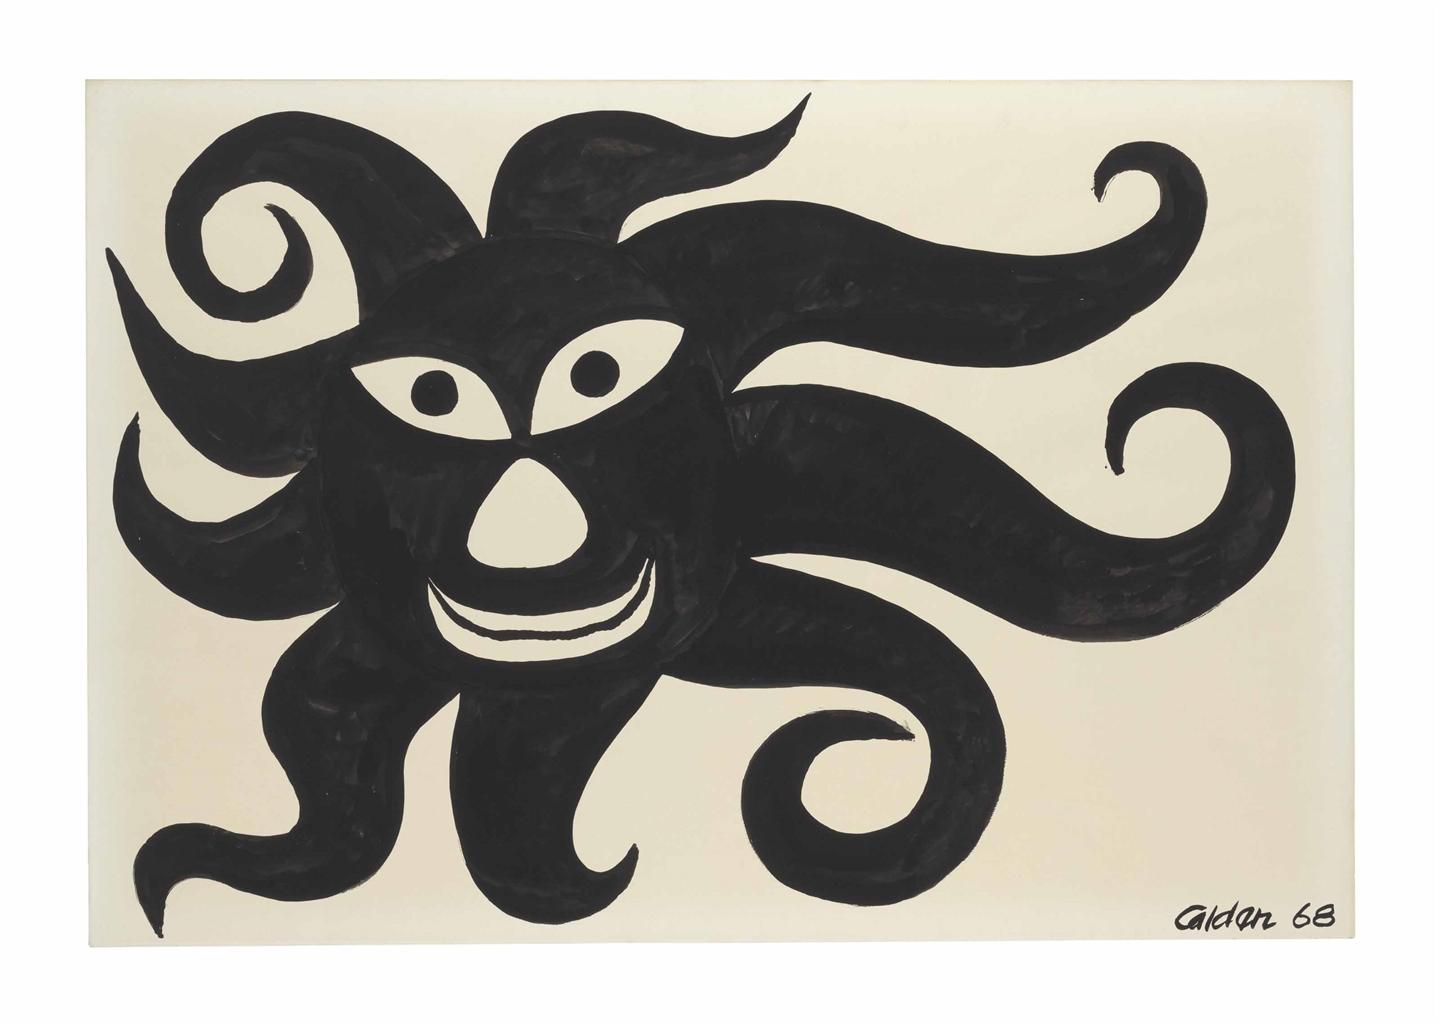 Alexander Calder-Soleil Noir (Black Sun)-1968